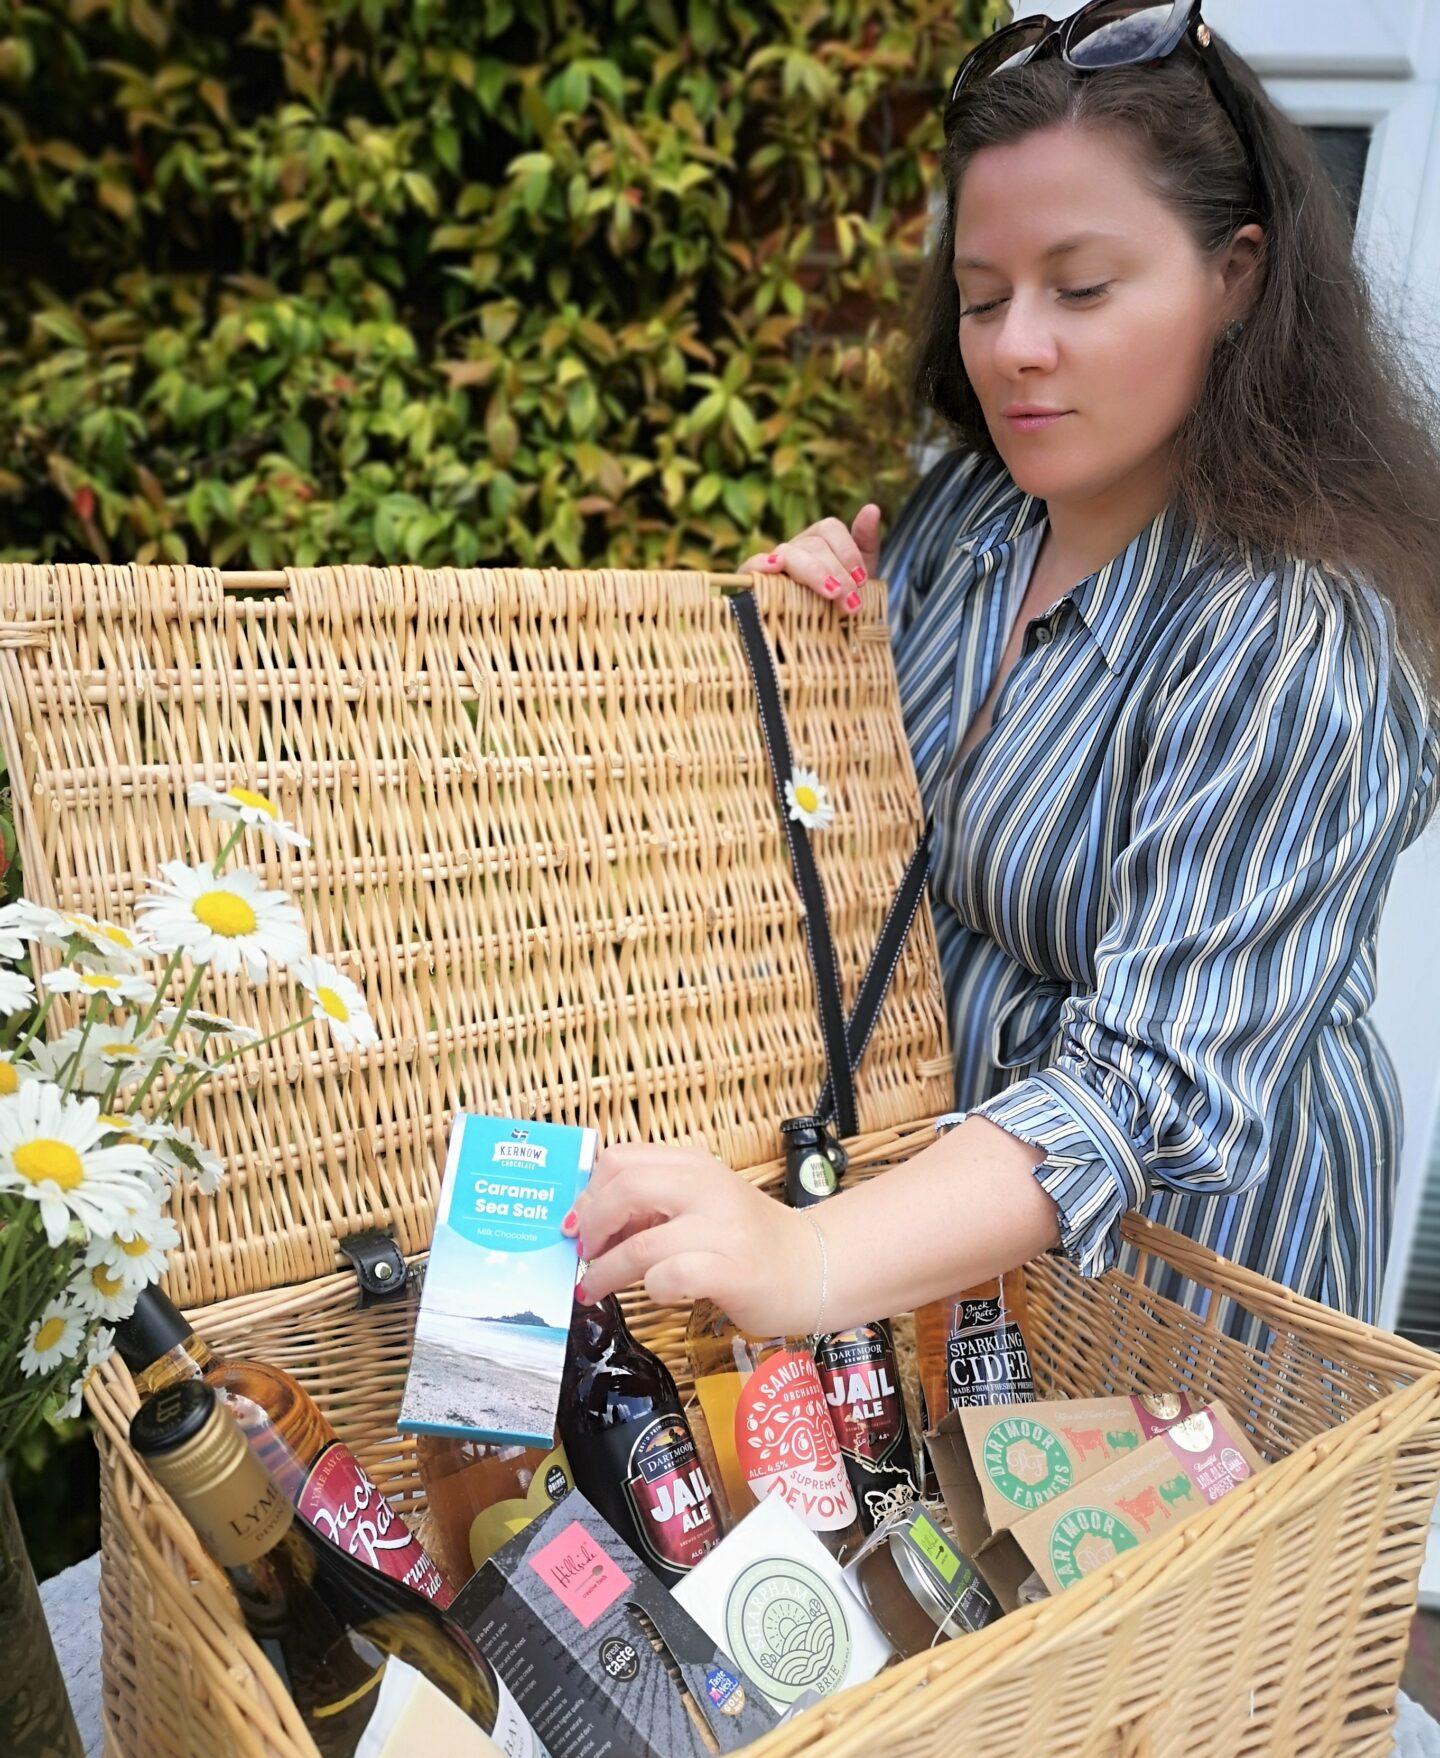 Devon Hamper, Devon Cider Wine & Cheese Hamper, Cornish Food, Food Hamper, Handpicked Food Hamper, Cornish Business, Devon, Father's Day Giveaway, Win, competition, giveaway, the Frenchie Mummy